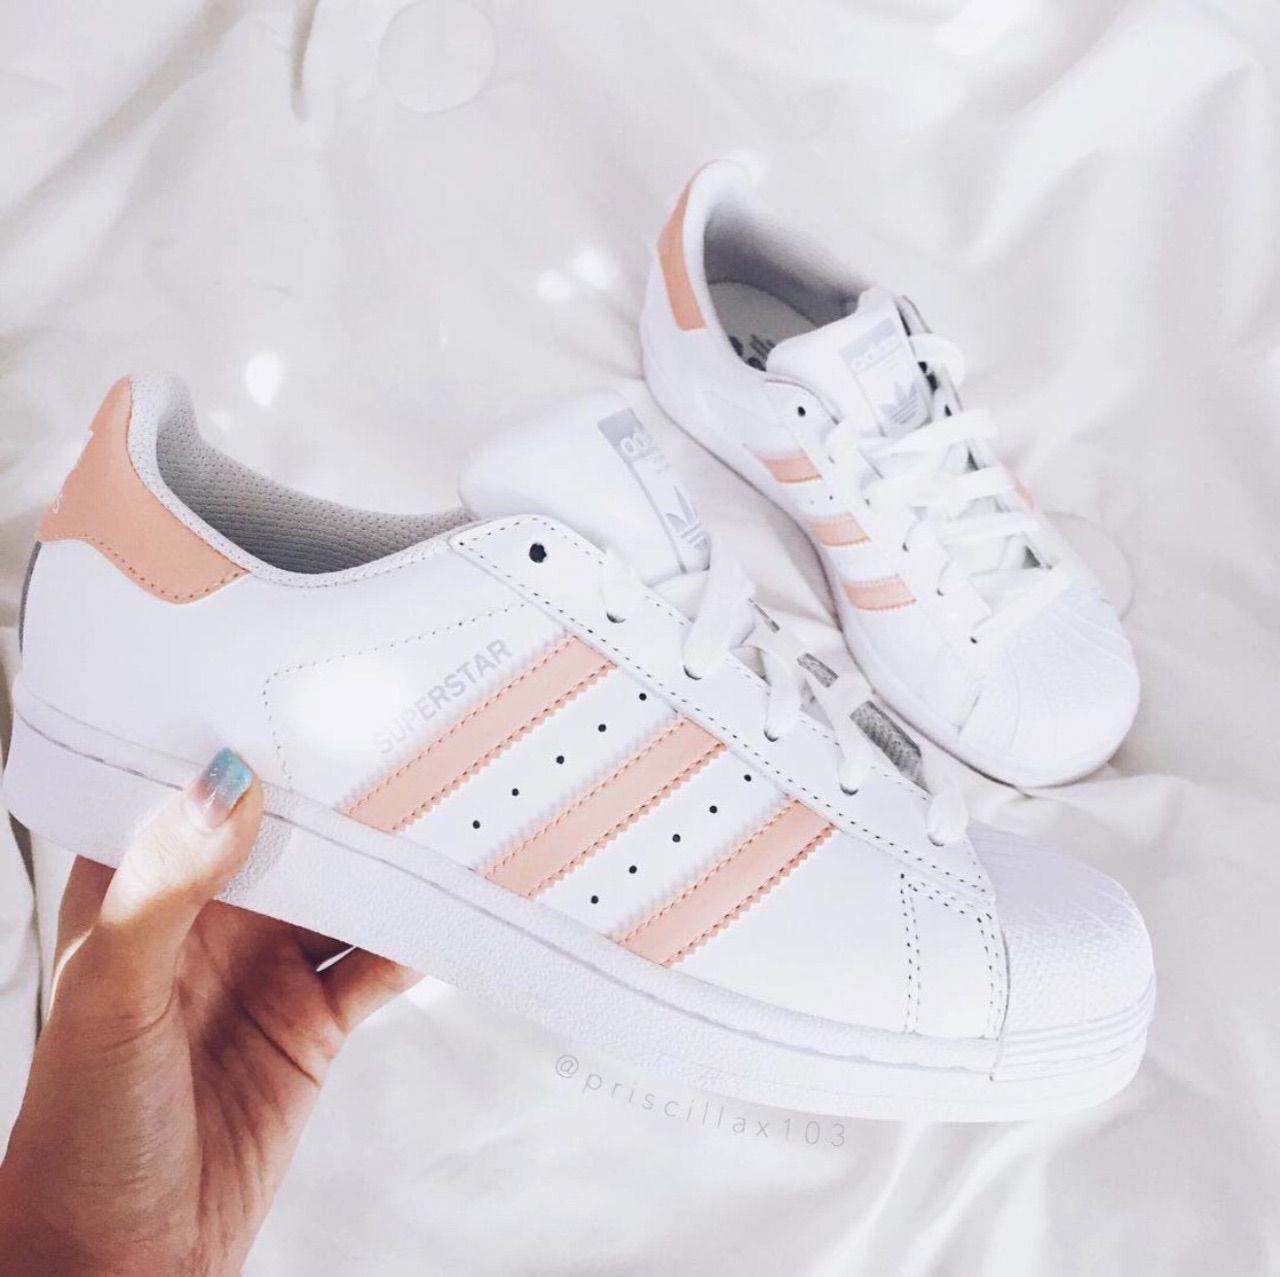 Adidas superstar ADIDAS Women's Shoes rover.ebay